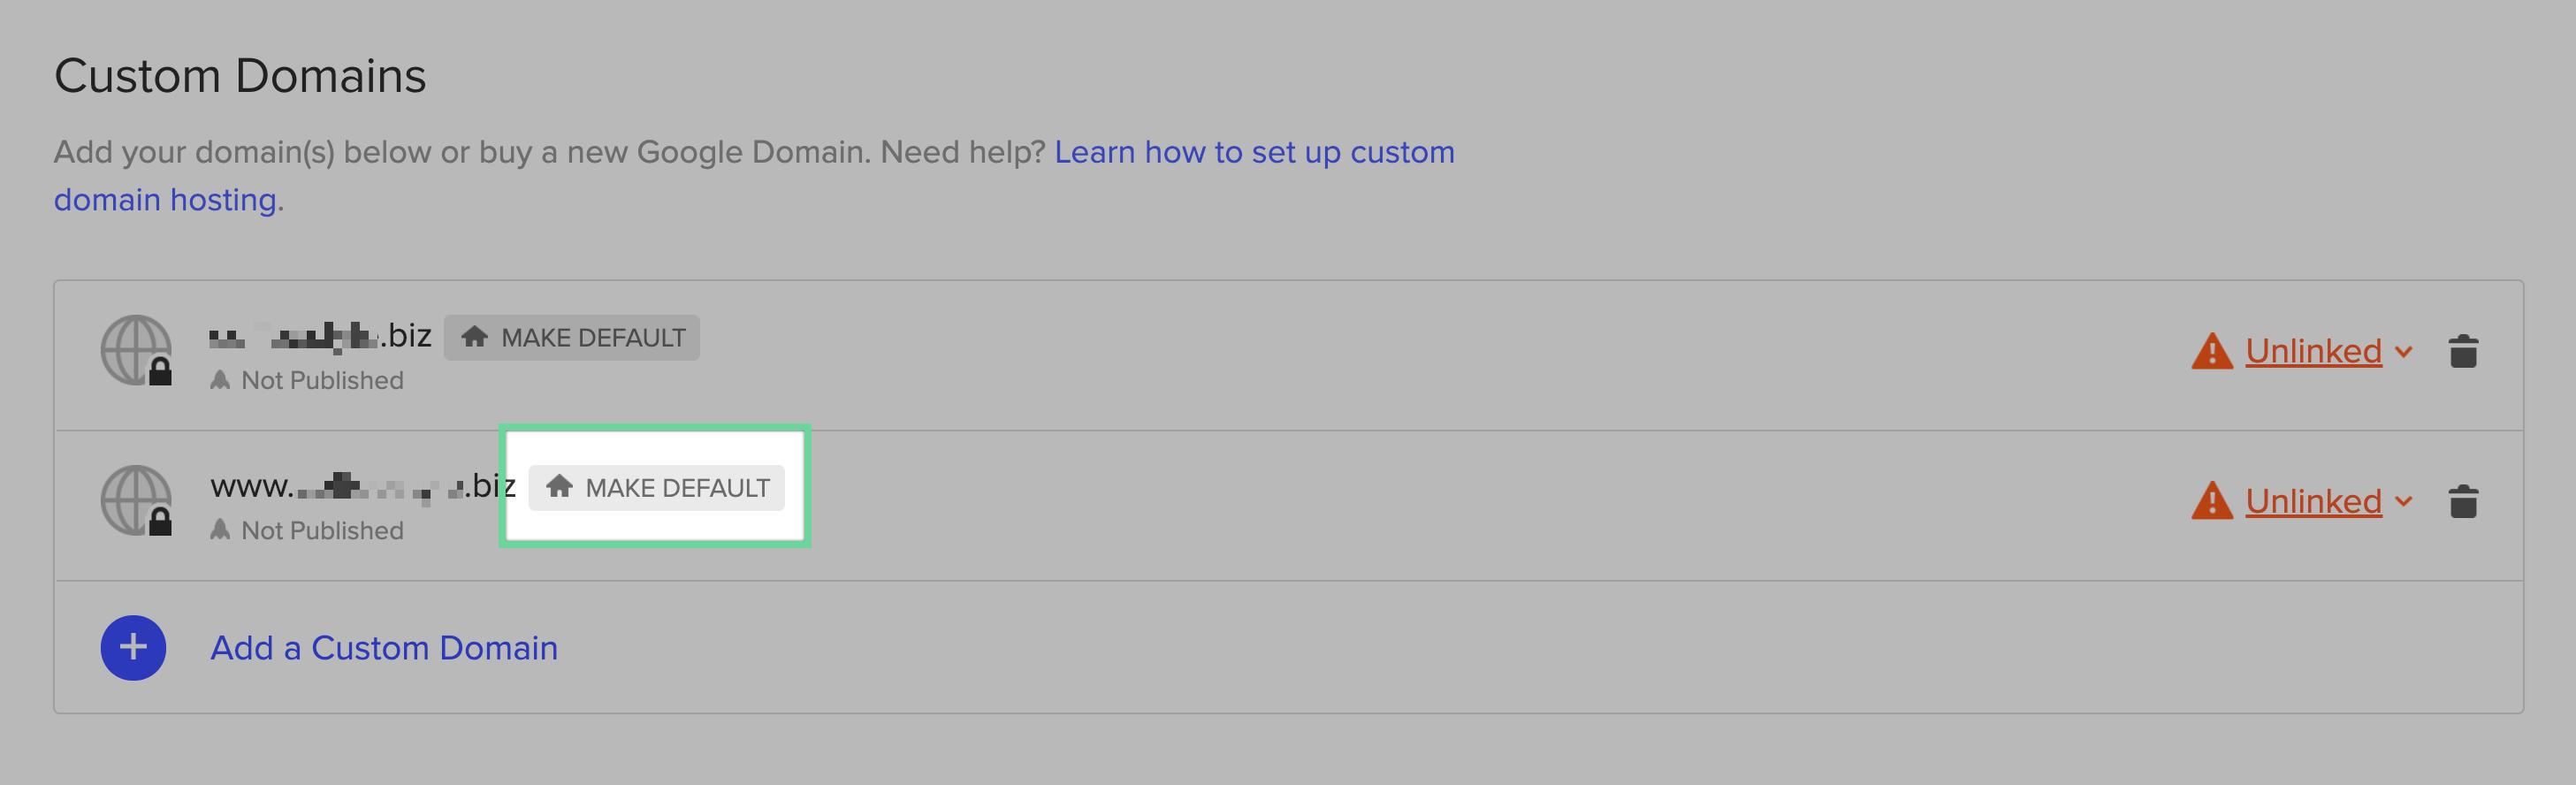 Make a domain the default domain.